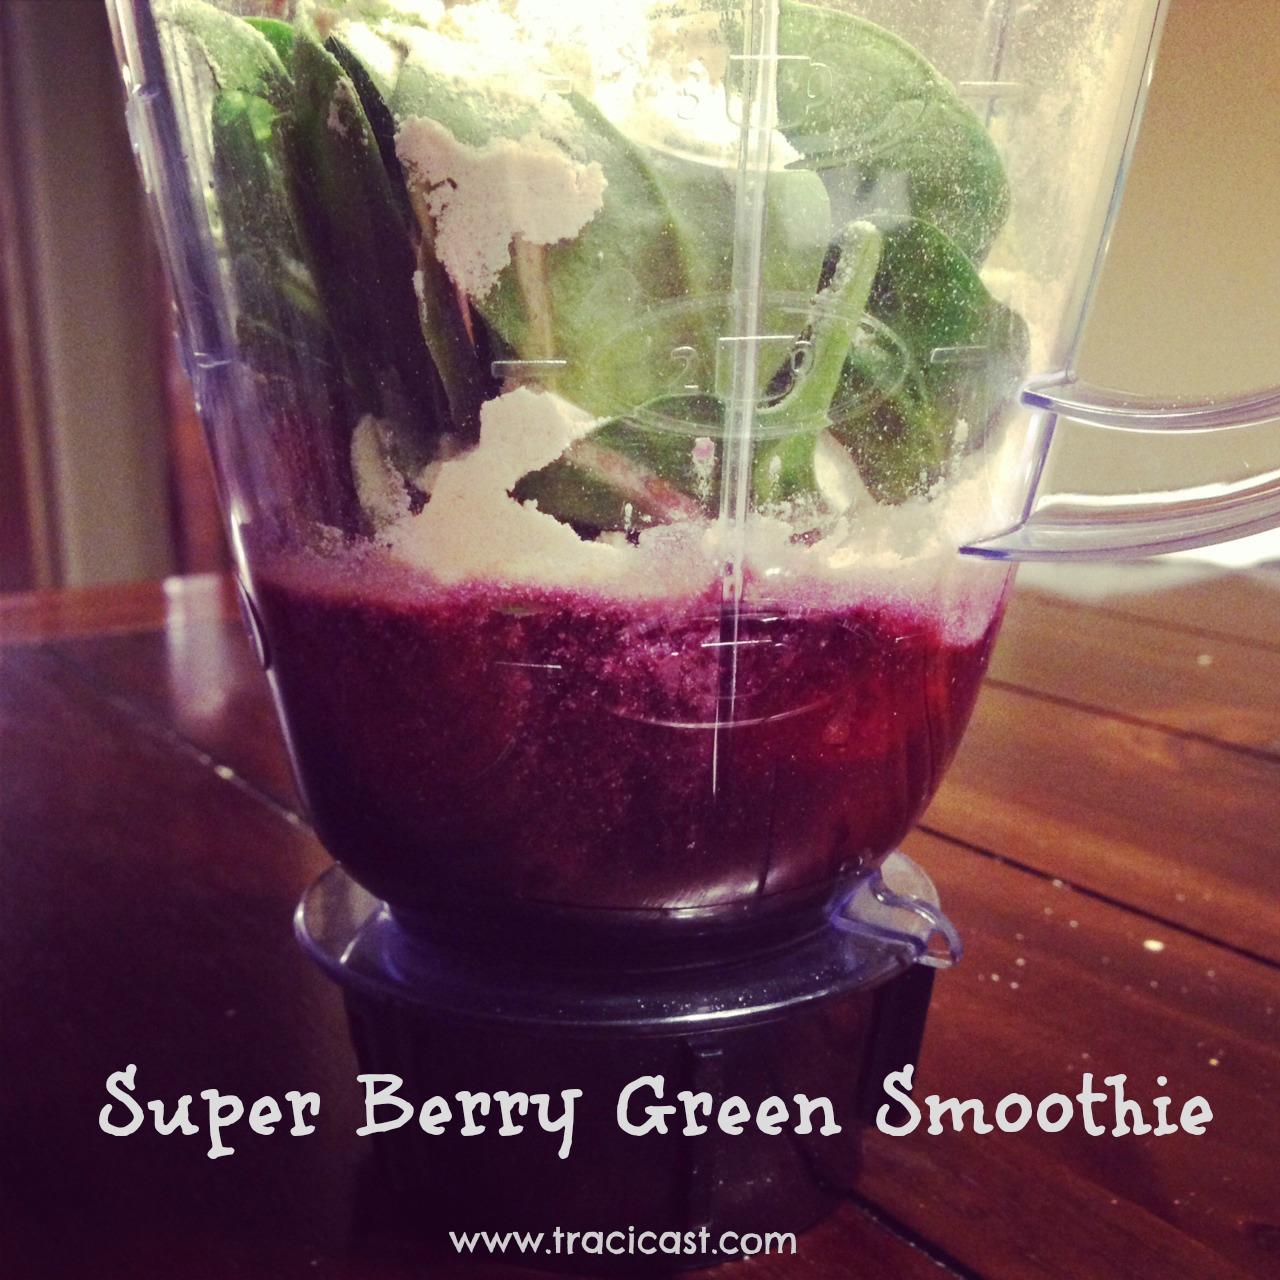 super-berry-green-smoothie.jpg